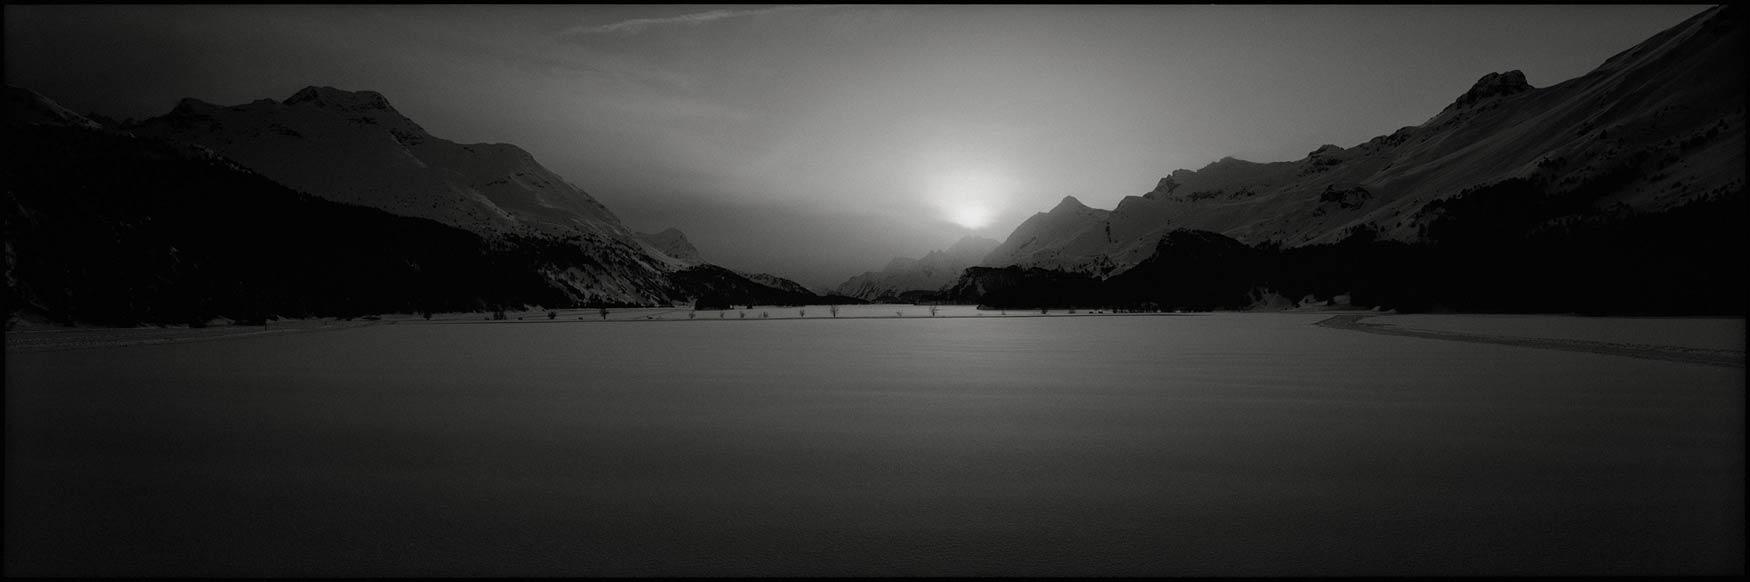 Engadin fine art photography by Christopher Thomas St. Moritz